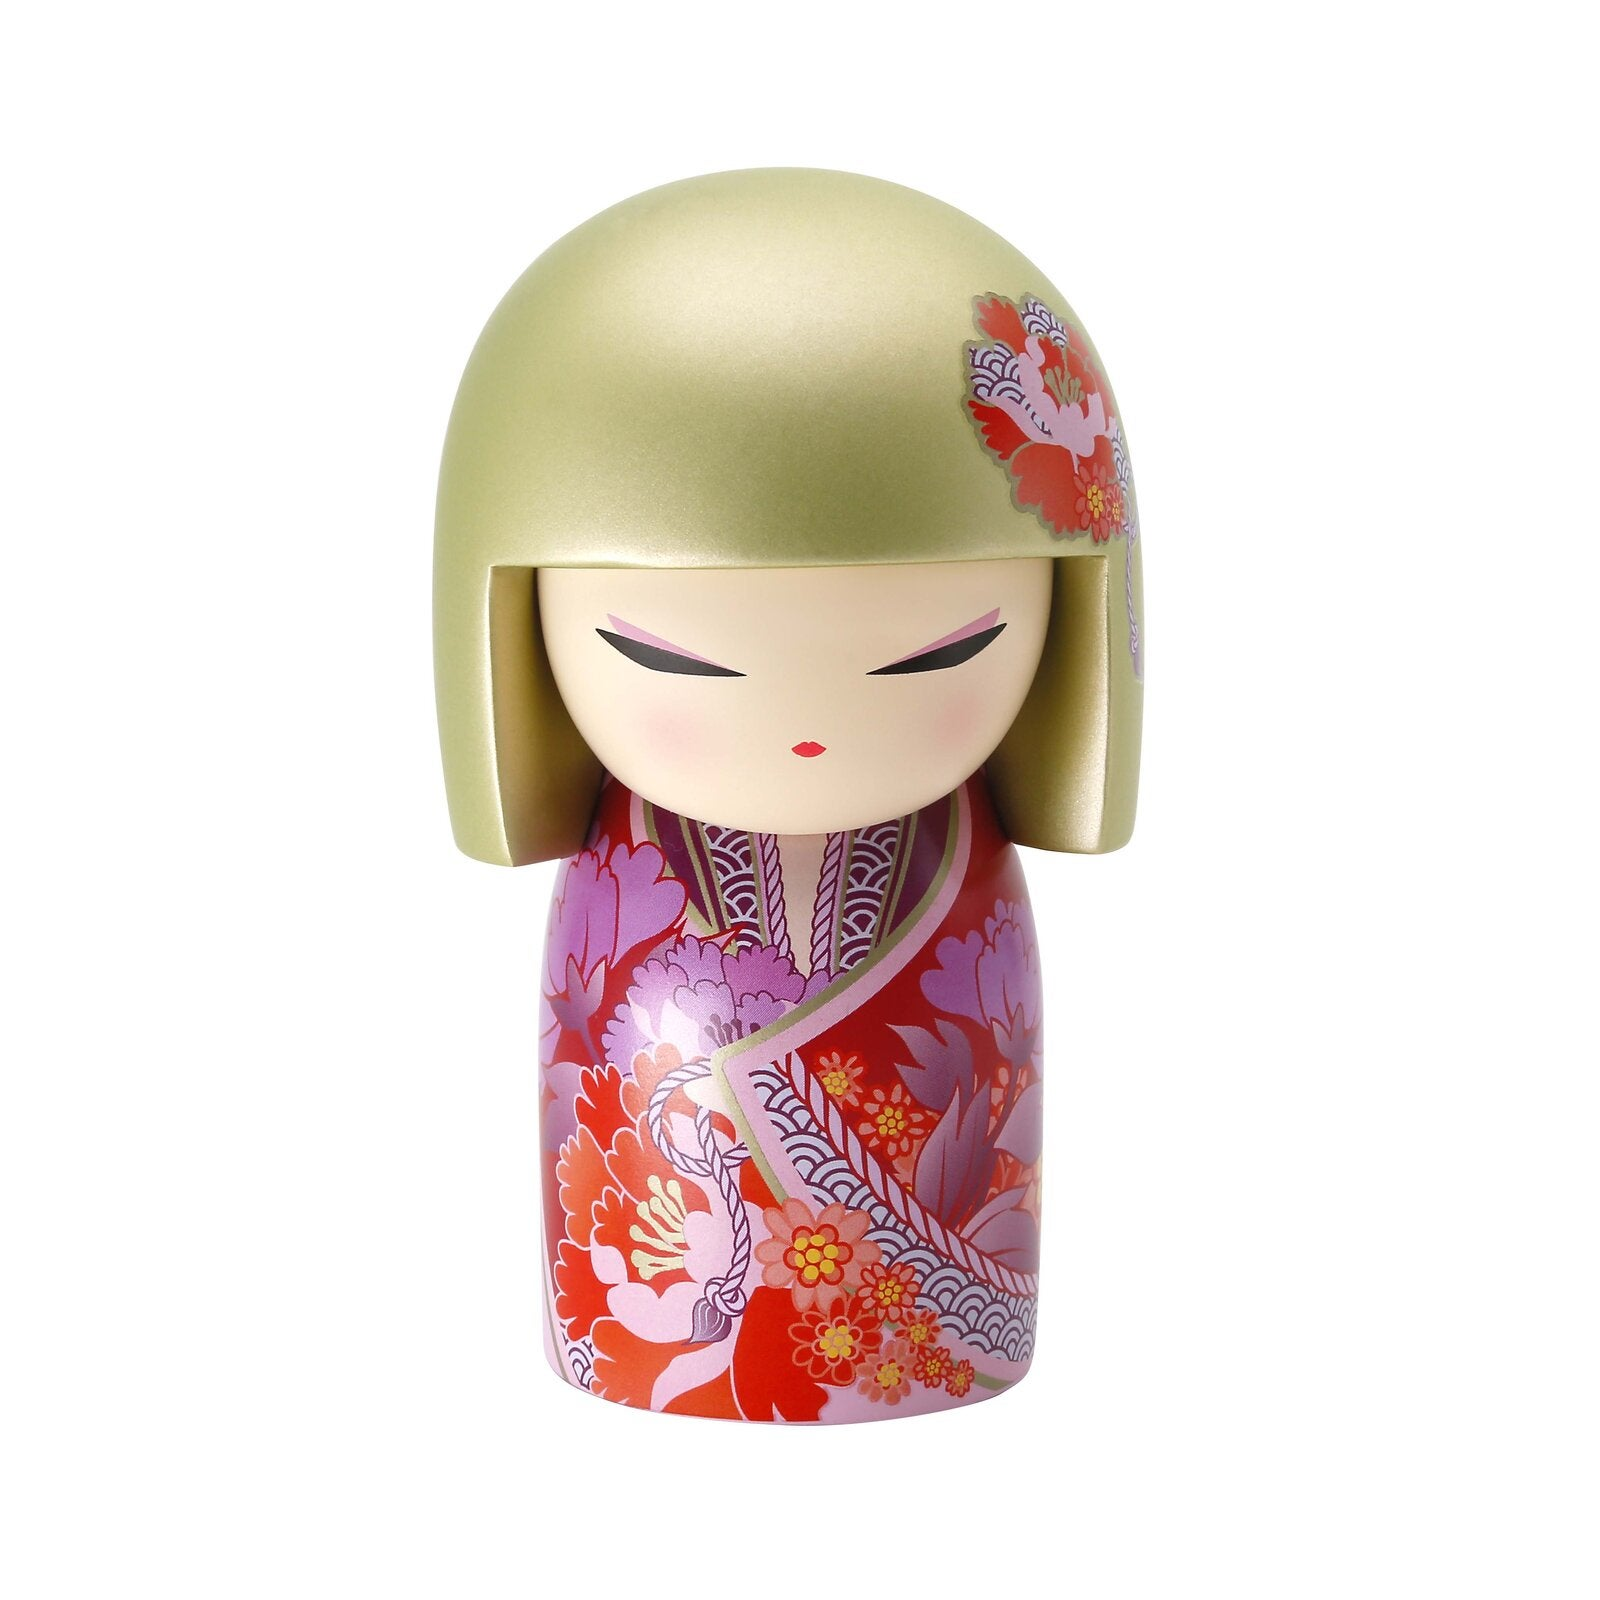 Kimmidoll Maxi Figurine - Ayana - Colourful